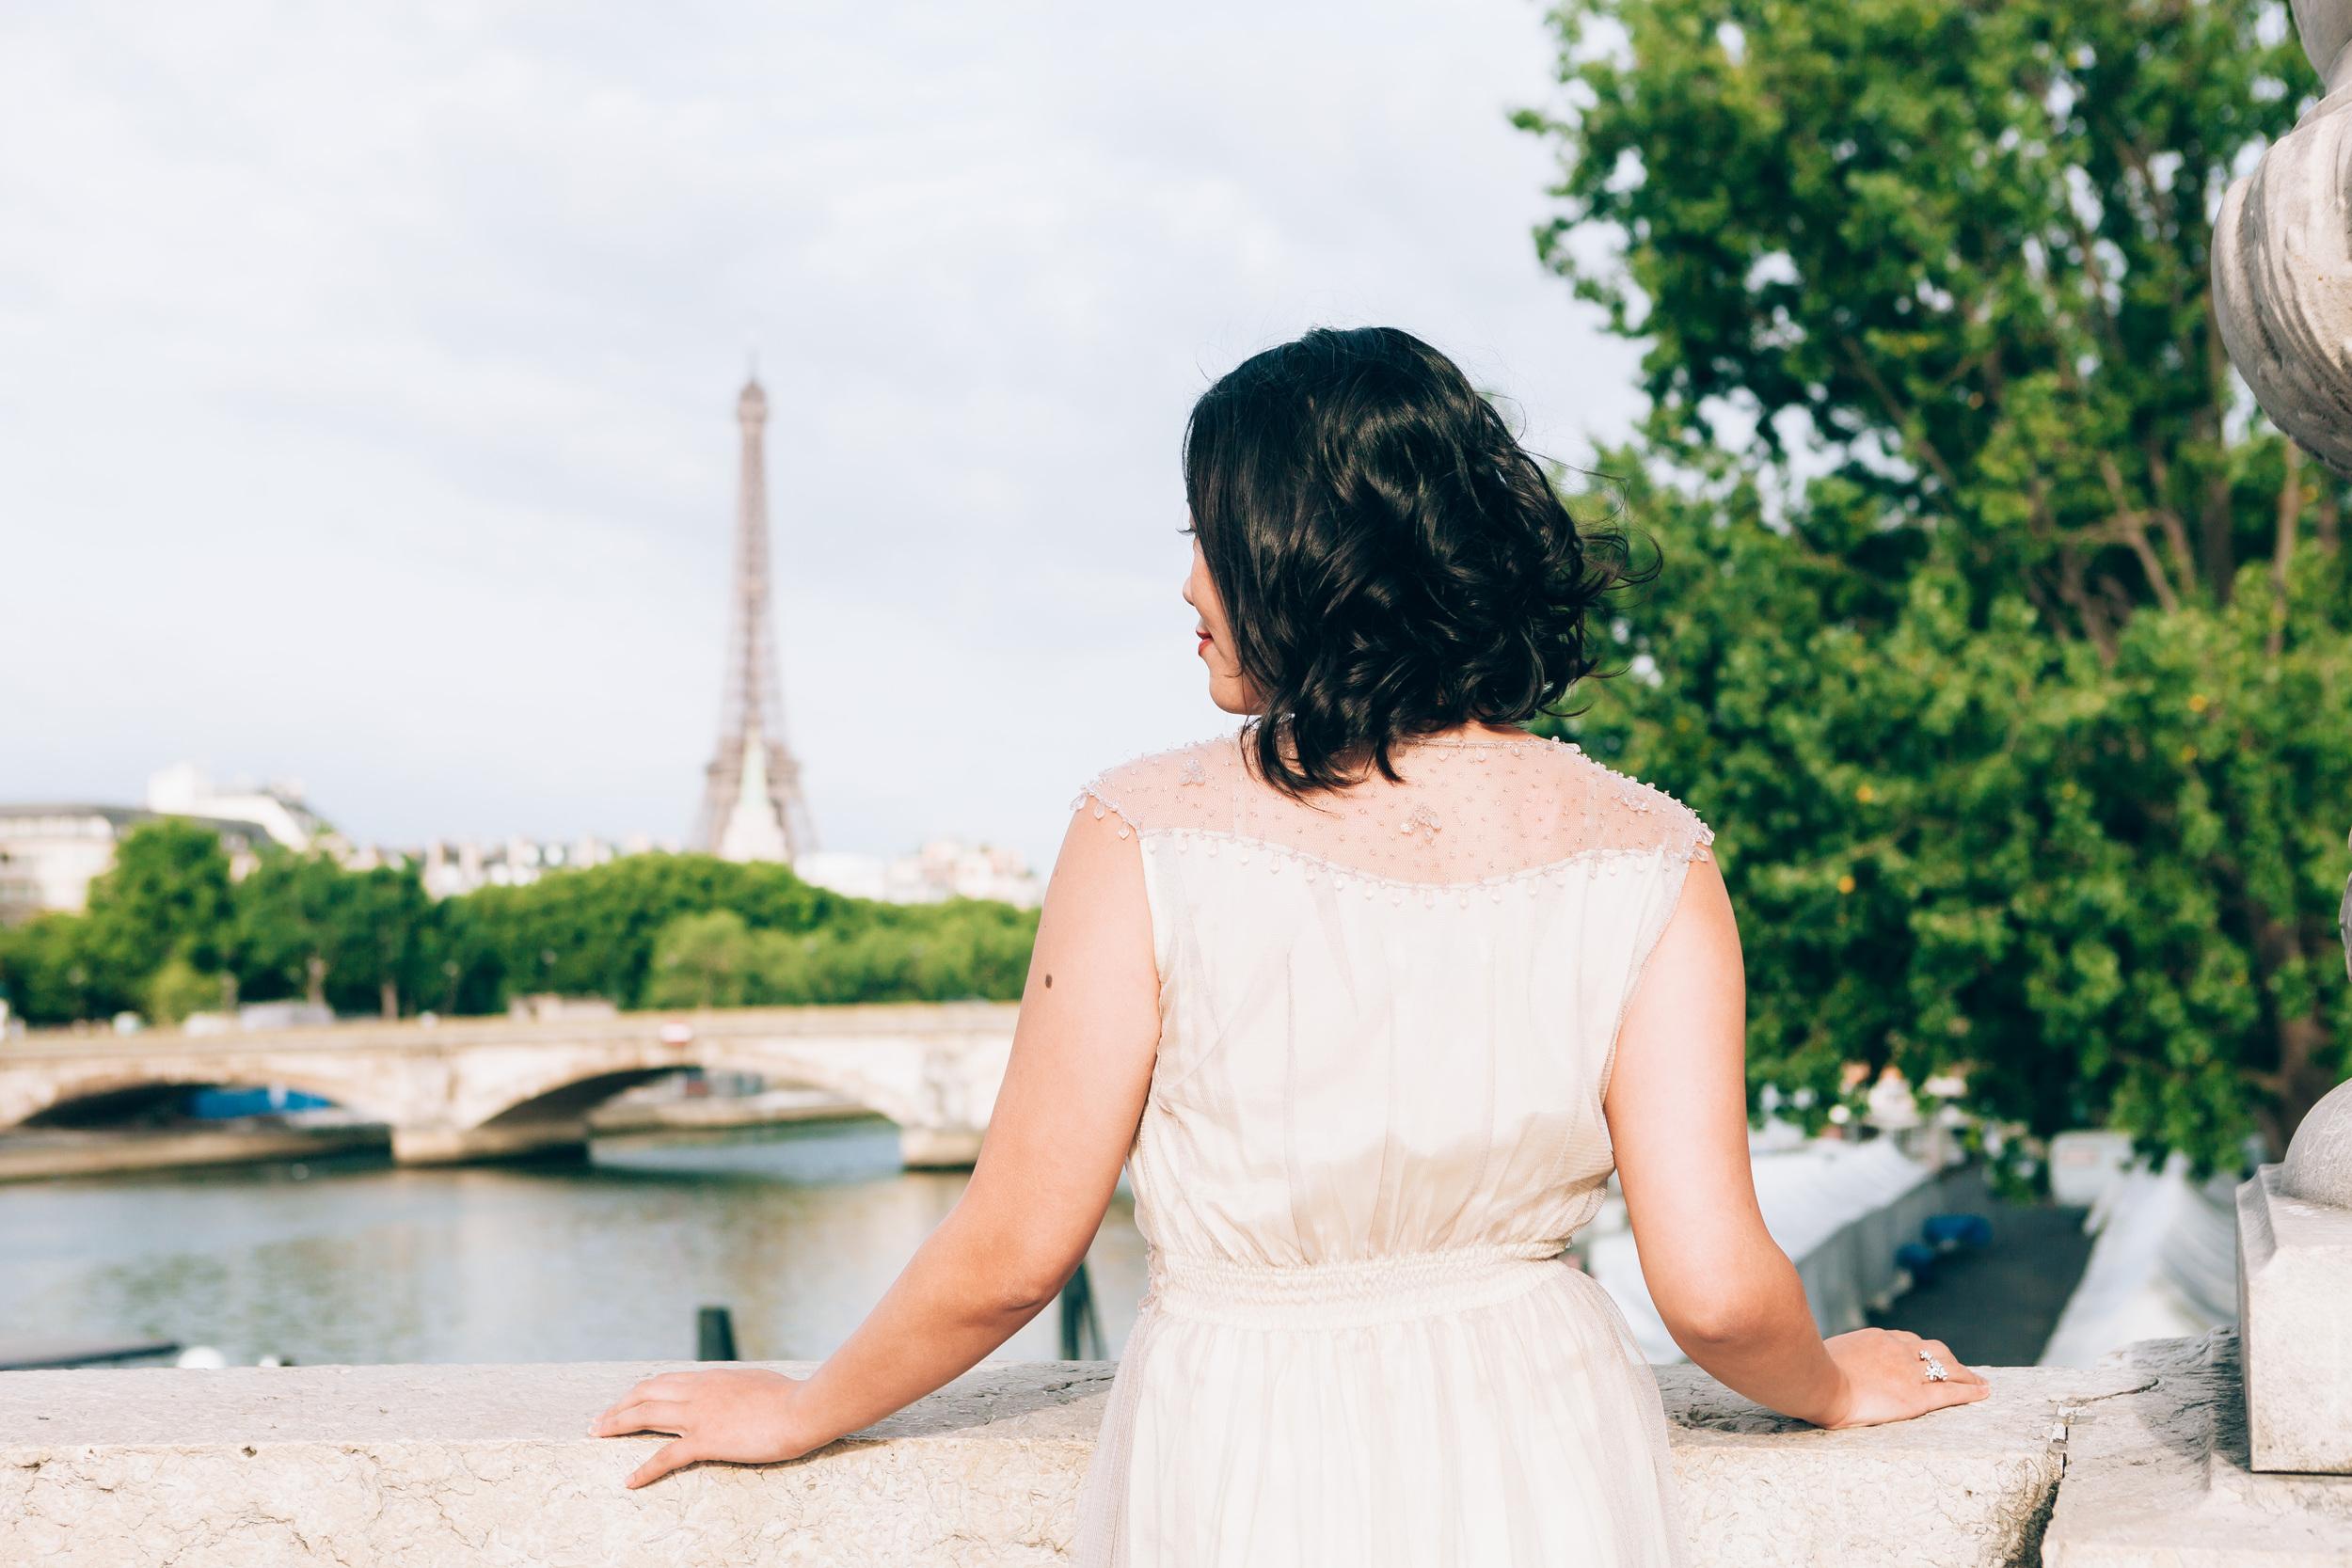 Paris Photographer, Alexander 3 bridge, Birthday, personal branding, IheartParisfr